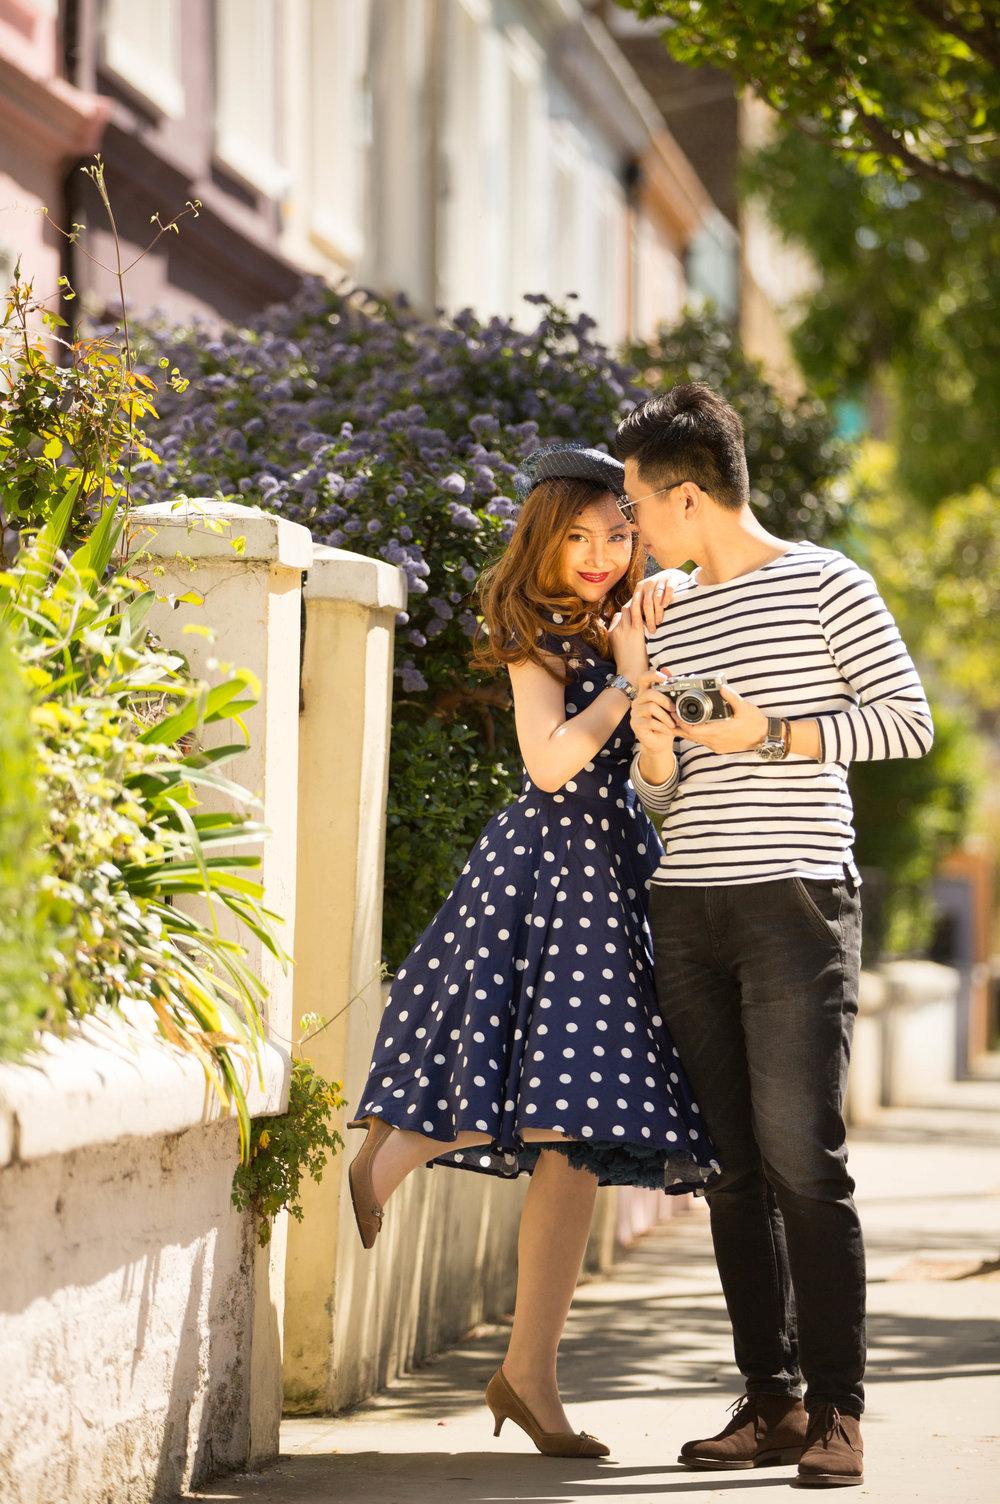 Asian-London-Vintage-Engagement-Wedding-Shoot-Notting-Hill-Regents-Park-4.jpeg